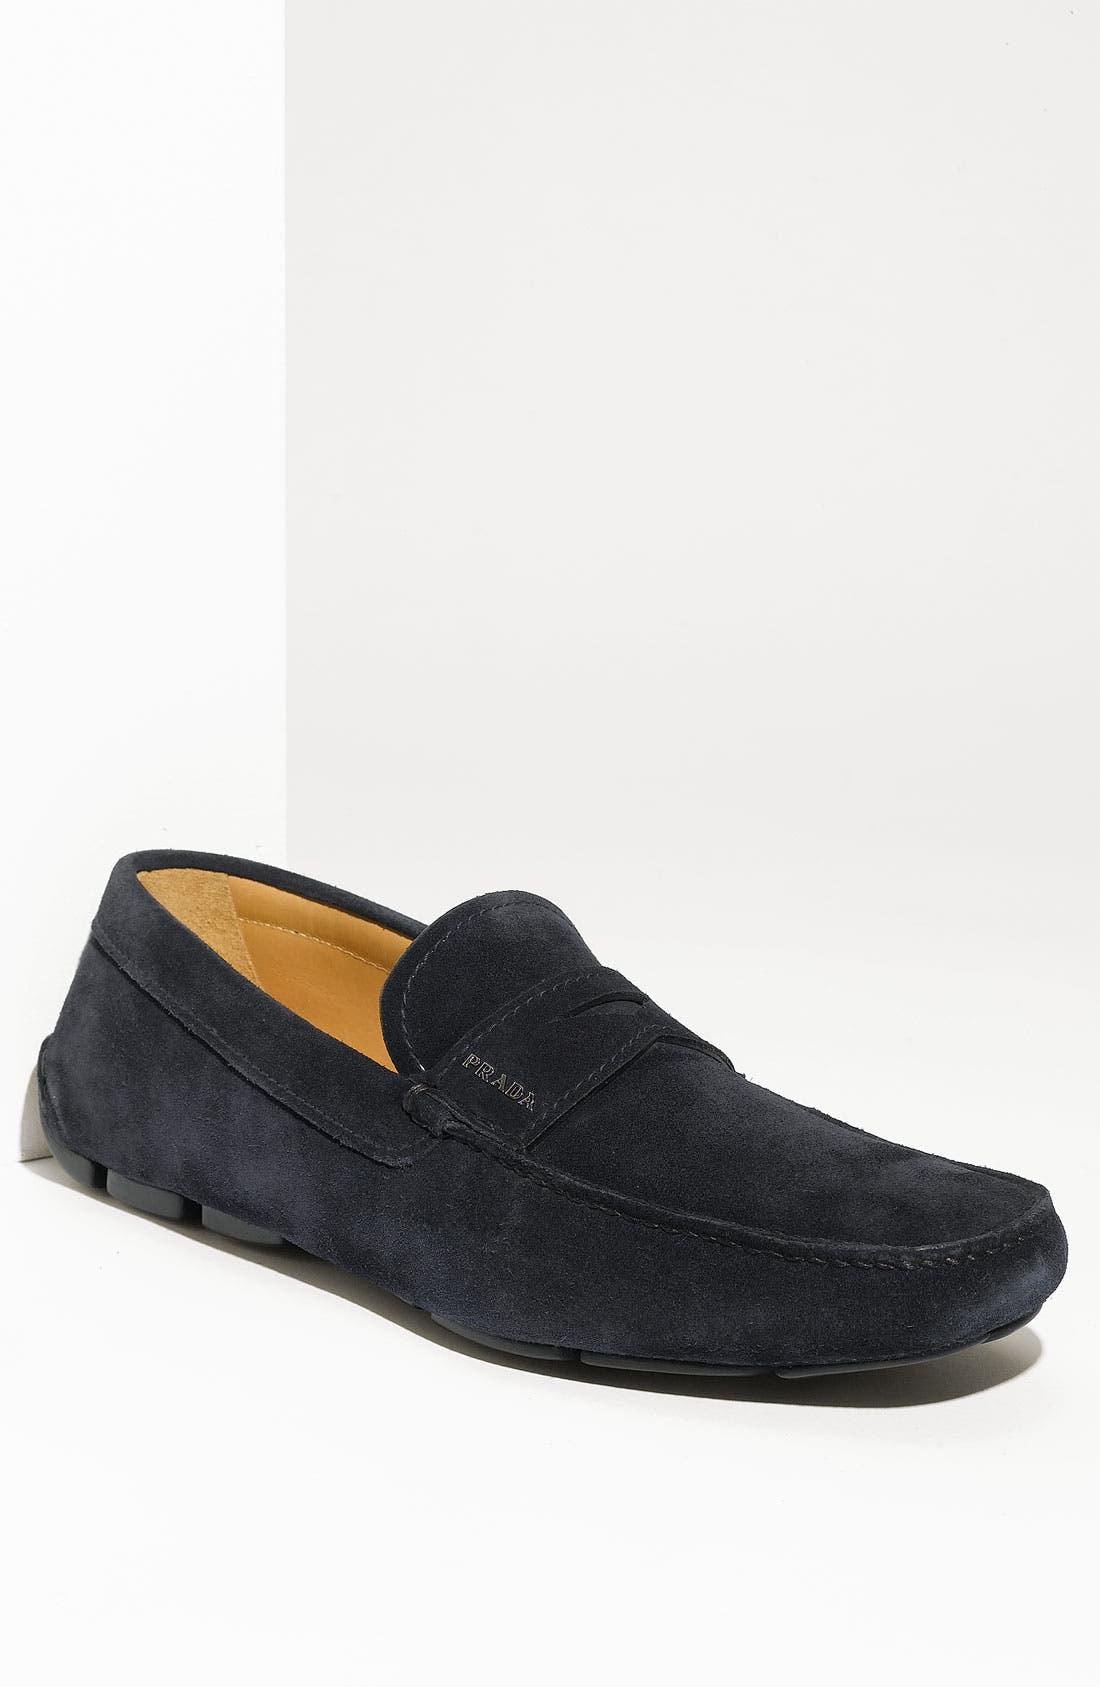 Main Image - Prada Suede Penny Driving Shoe (Men)